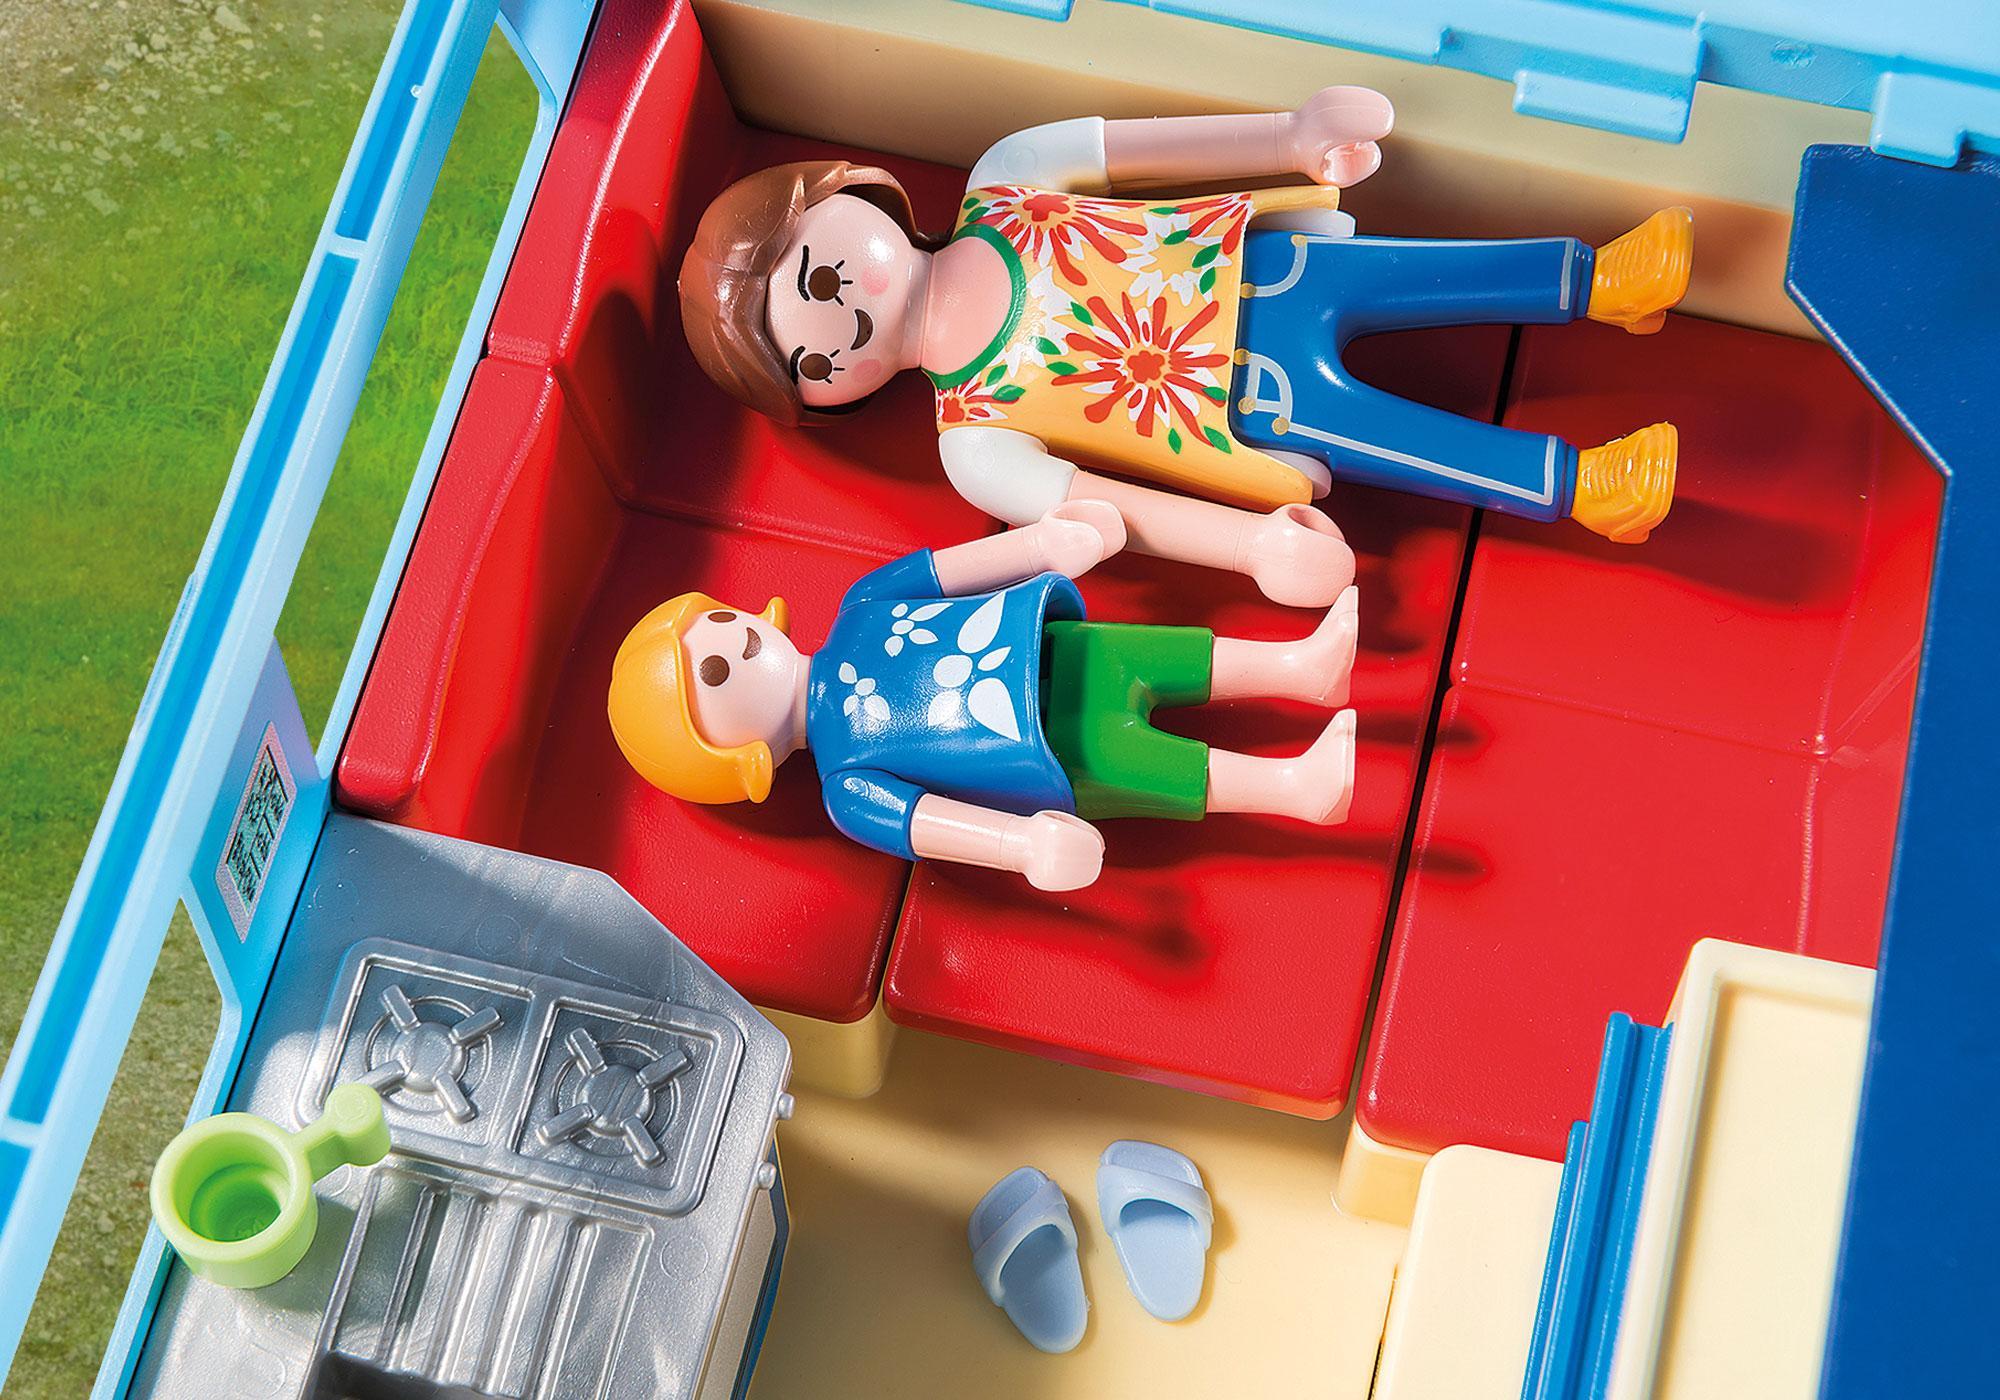 http://media.playmobil.com/i/playmobil/9502_product_extra3/PLAYMOBIL-FunPark Pickup med husvagn